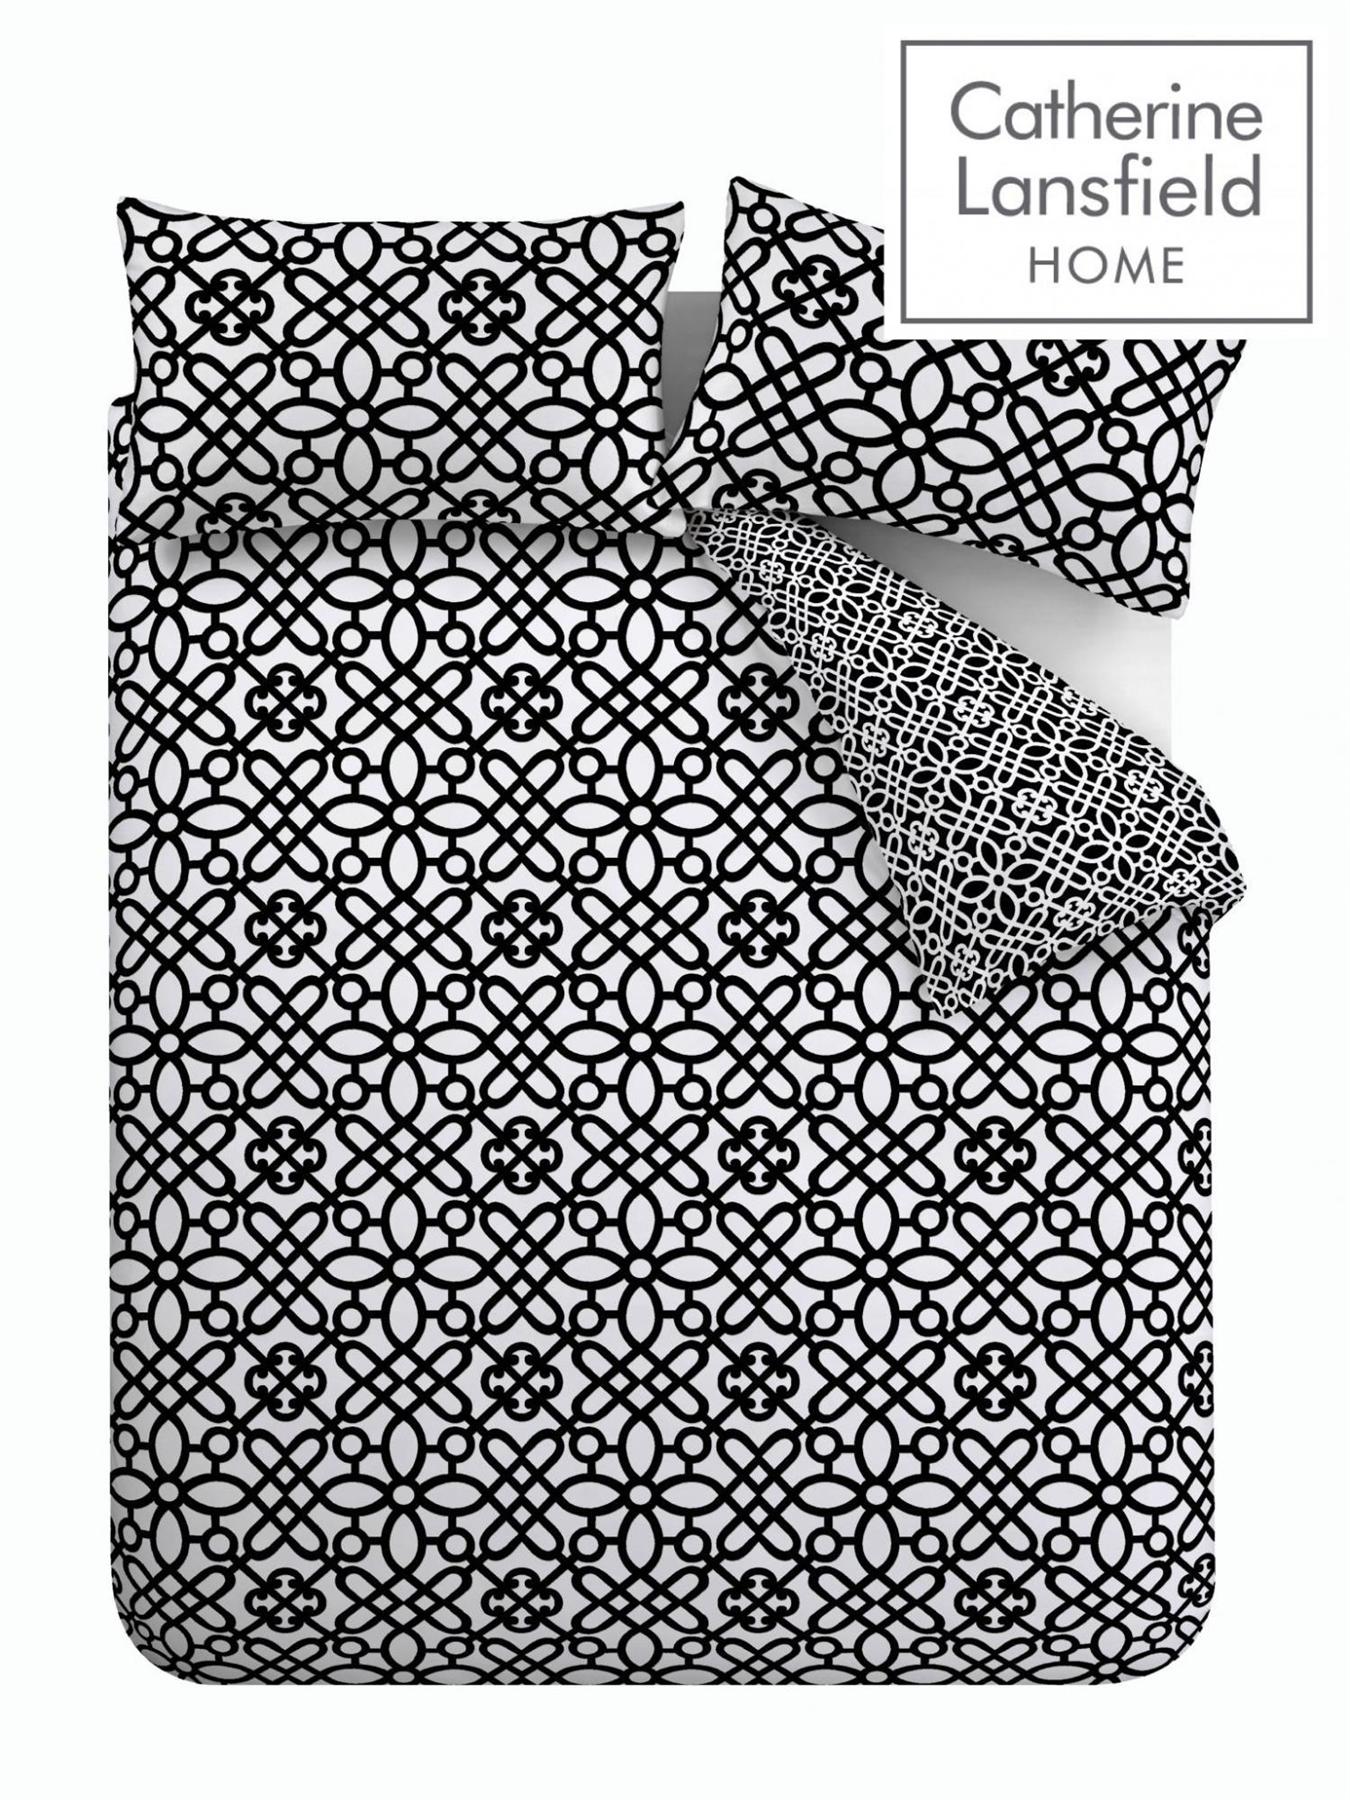 Catherine-Lansfield-Medina-Enrejado-Funda-De-Almohada-Cama-Conjunto-de-Edredon-Negro-Blanco-Casa miniatura 11